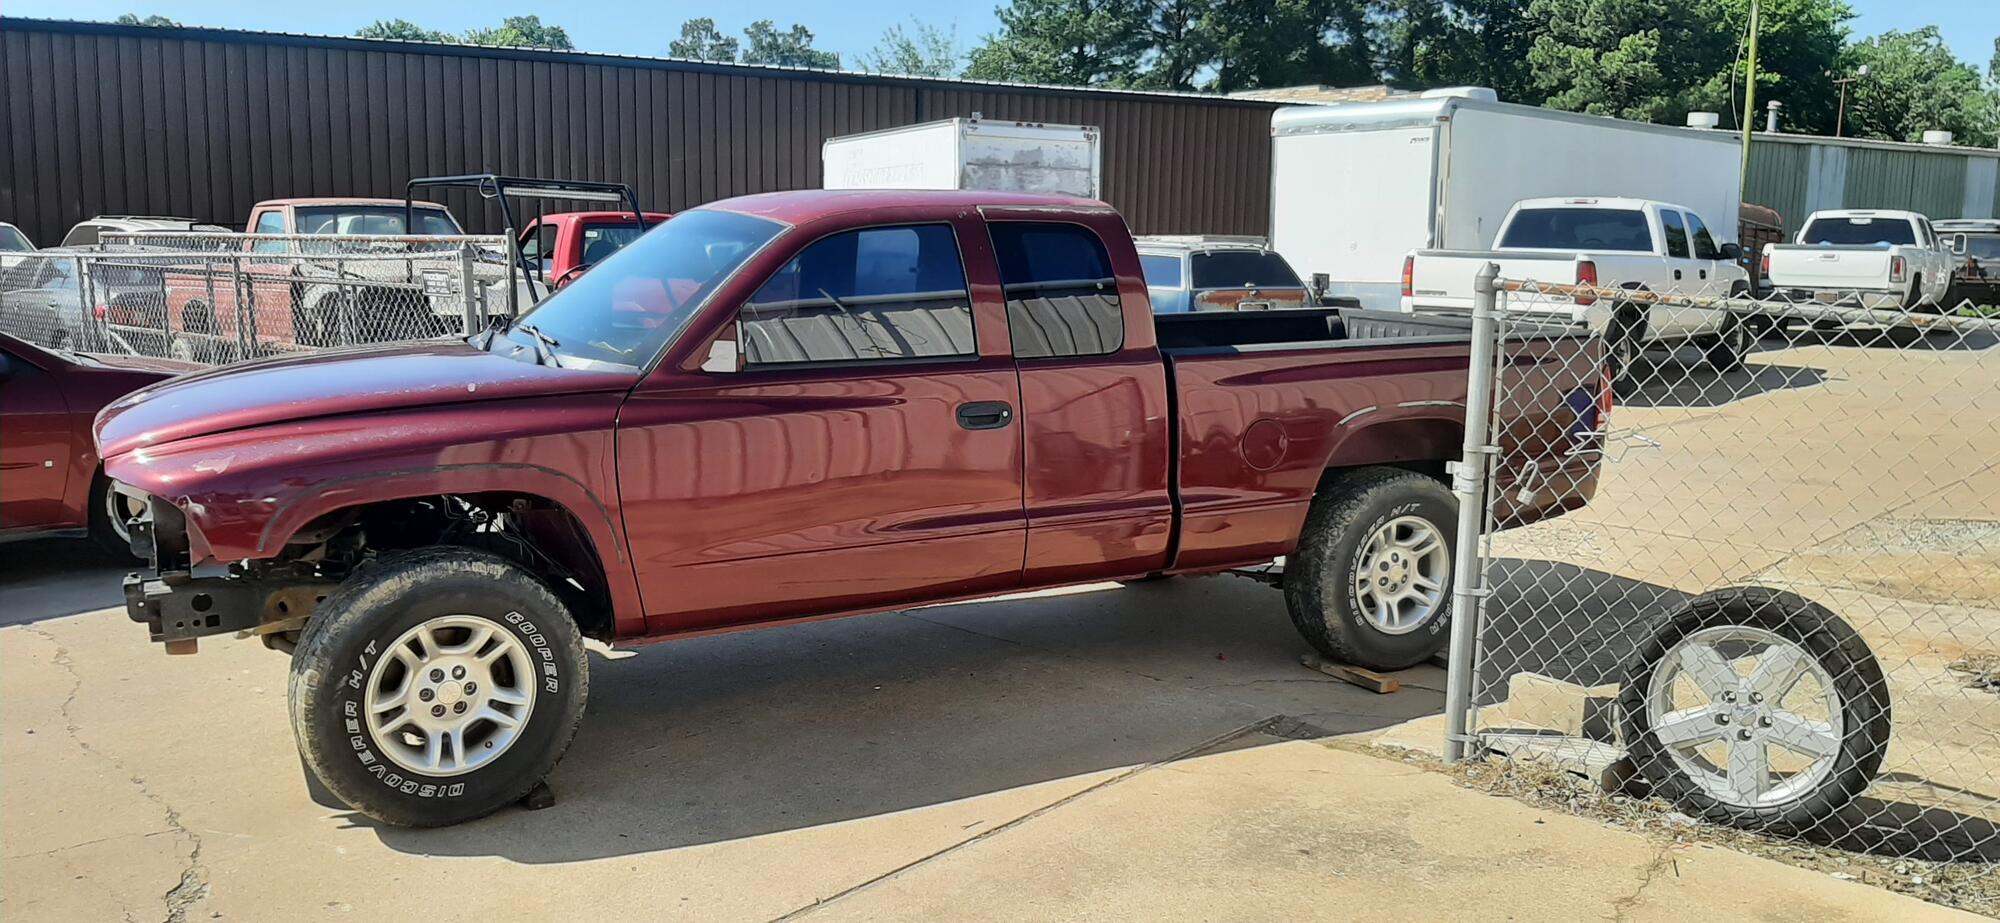 Name:  Dodge at shop.jpg Views: 448 Size:  306.1 KB